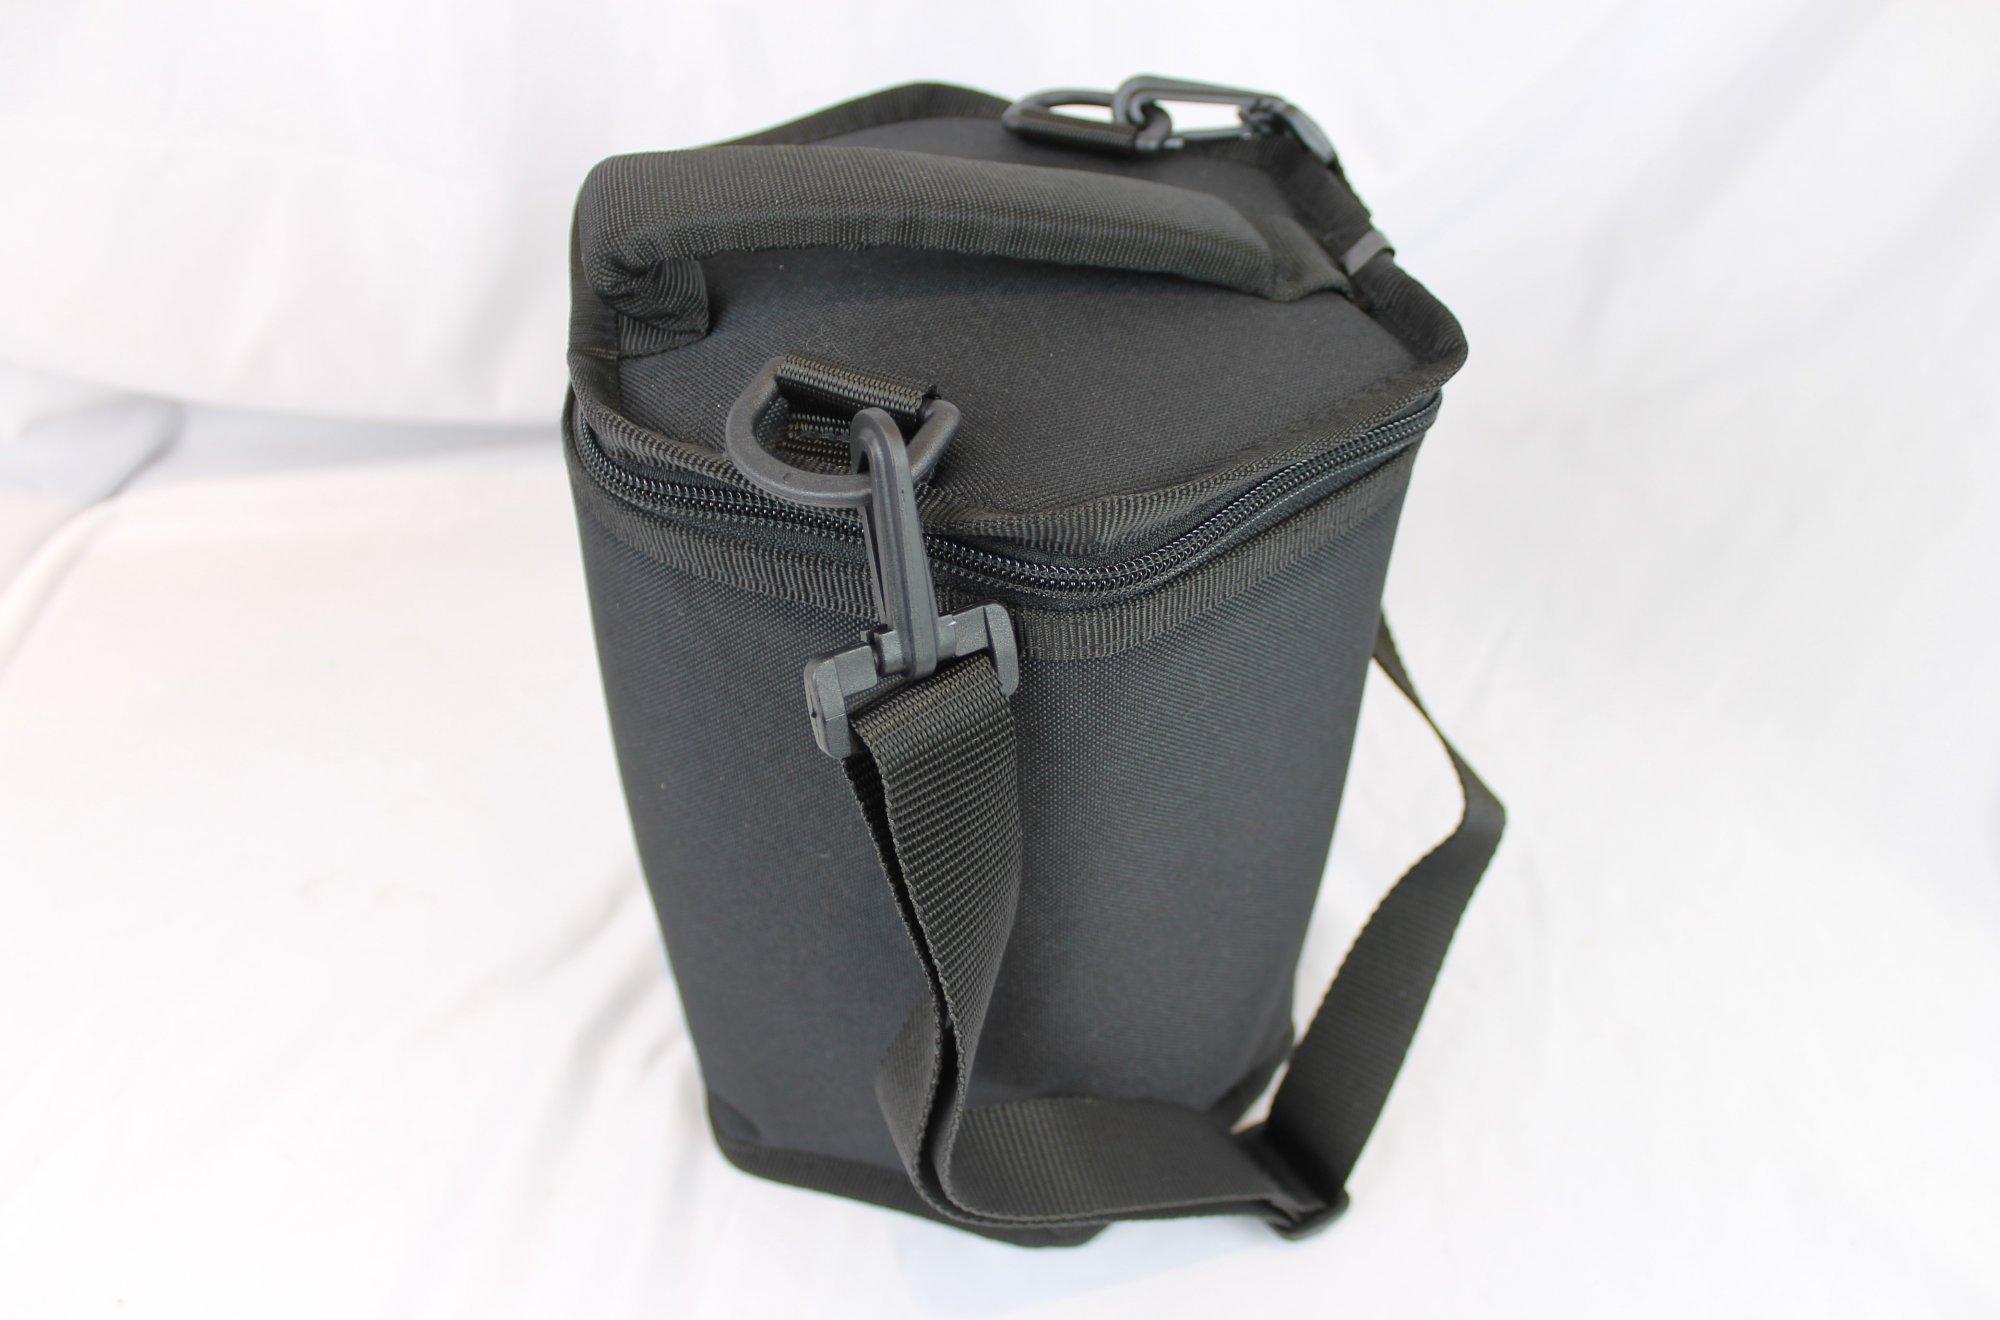 NEW Black Fuselli Gig Bag for Concertina 8.5 x 7